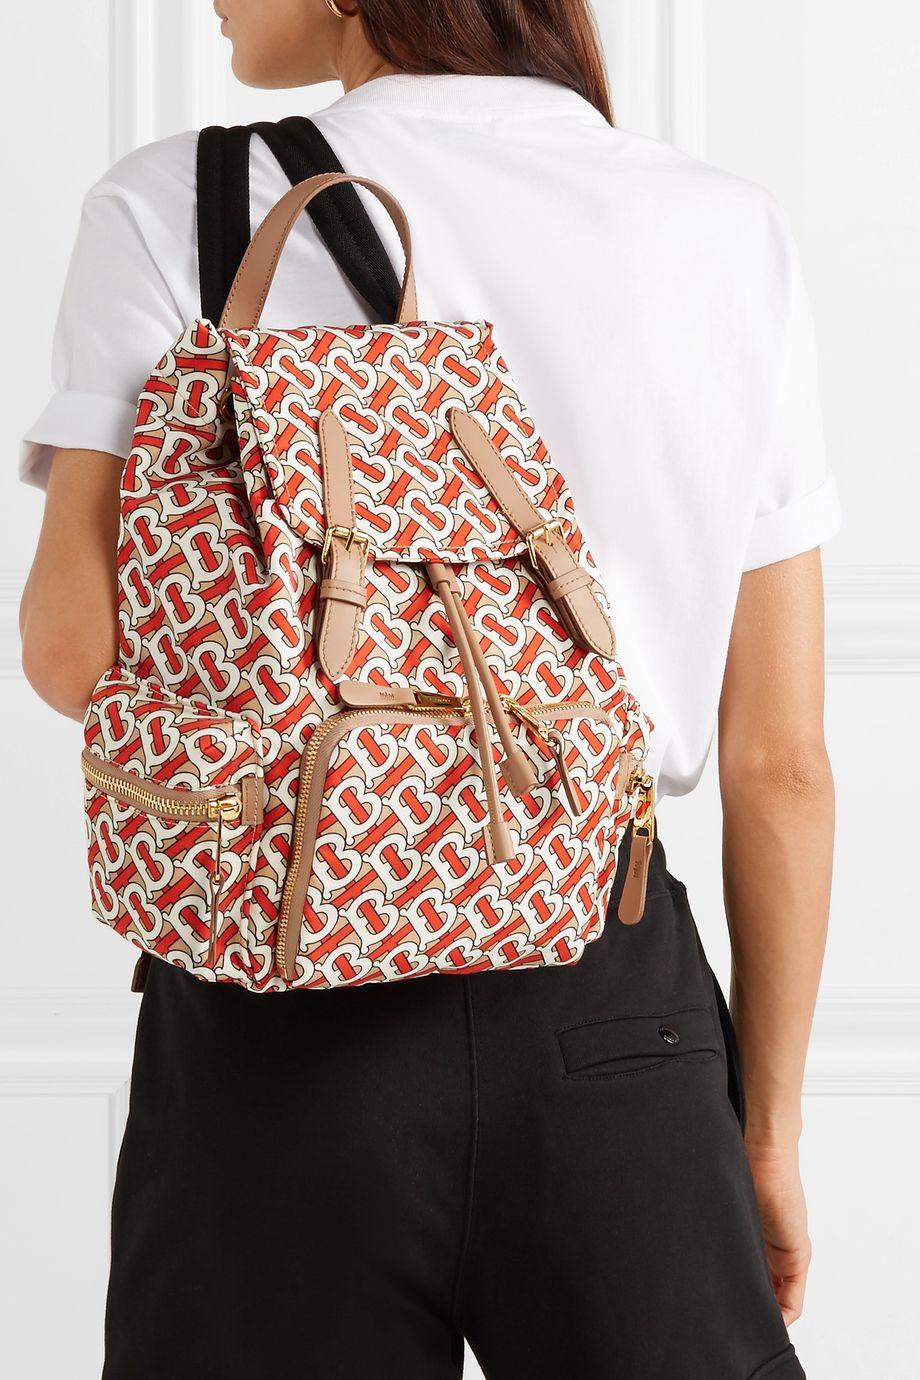 Burberry Medium leather-trimmed printed gabardine backpack